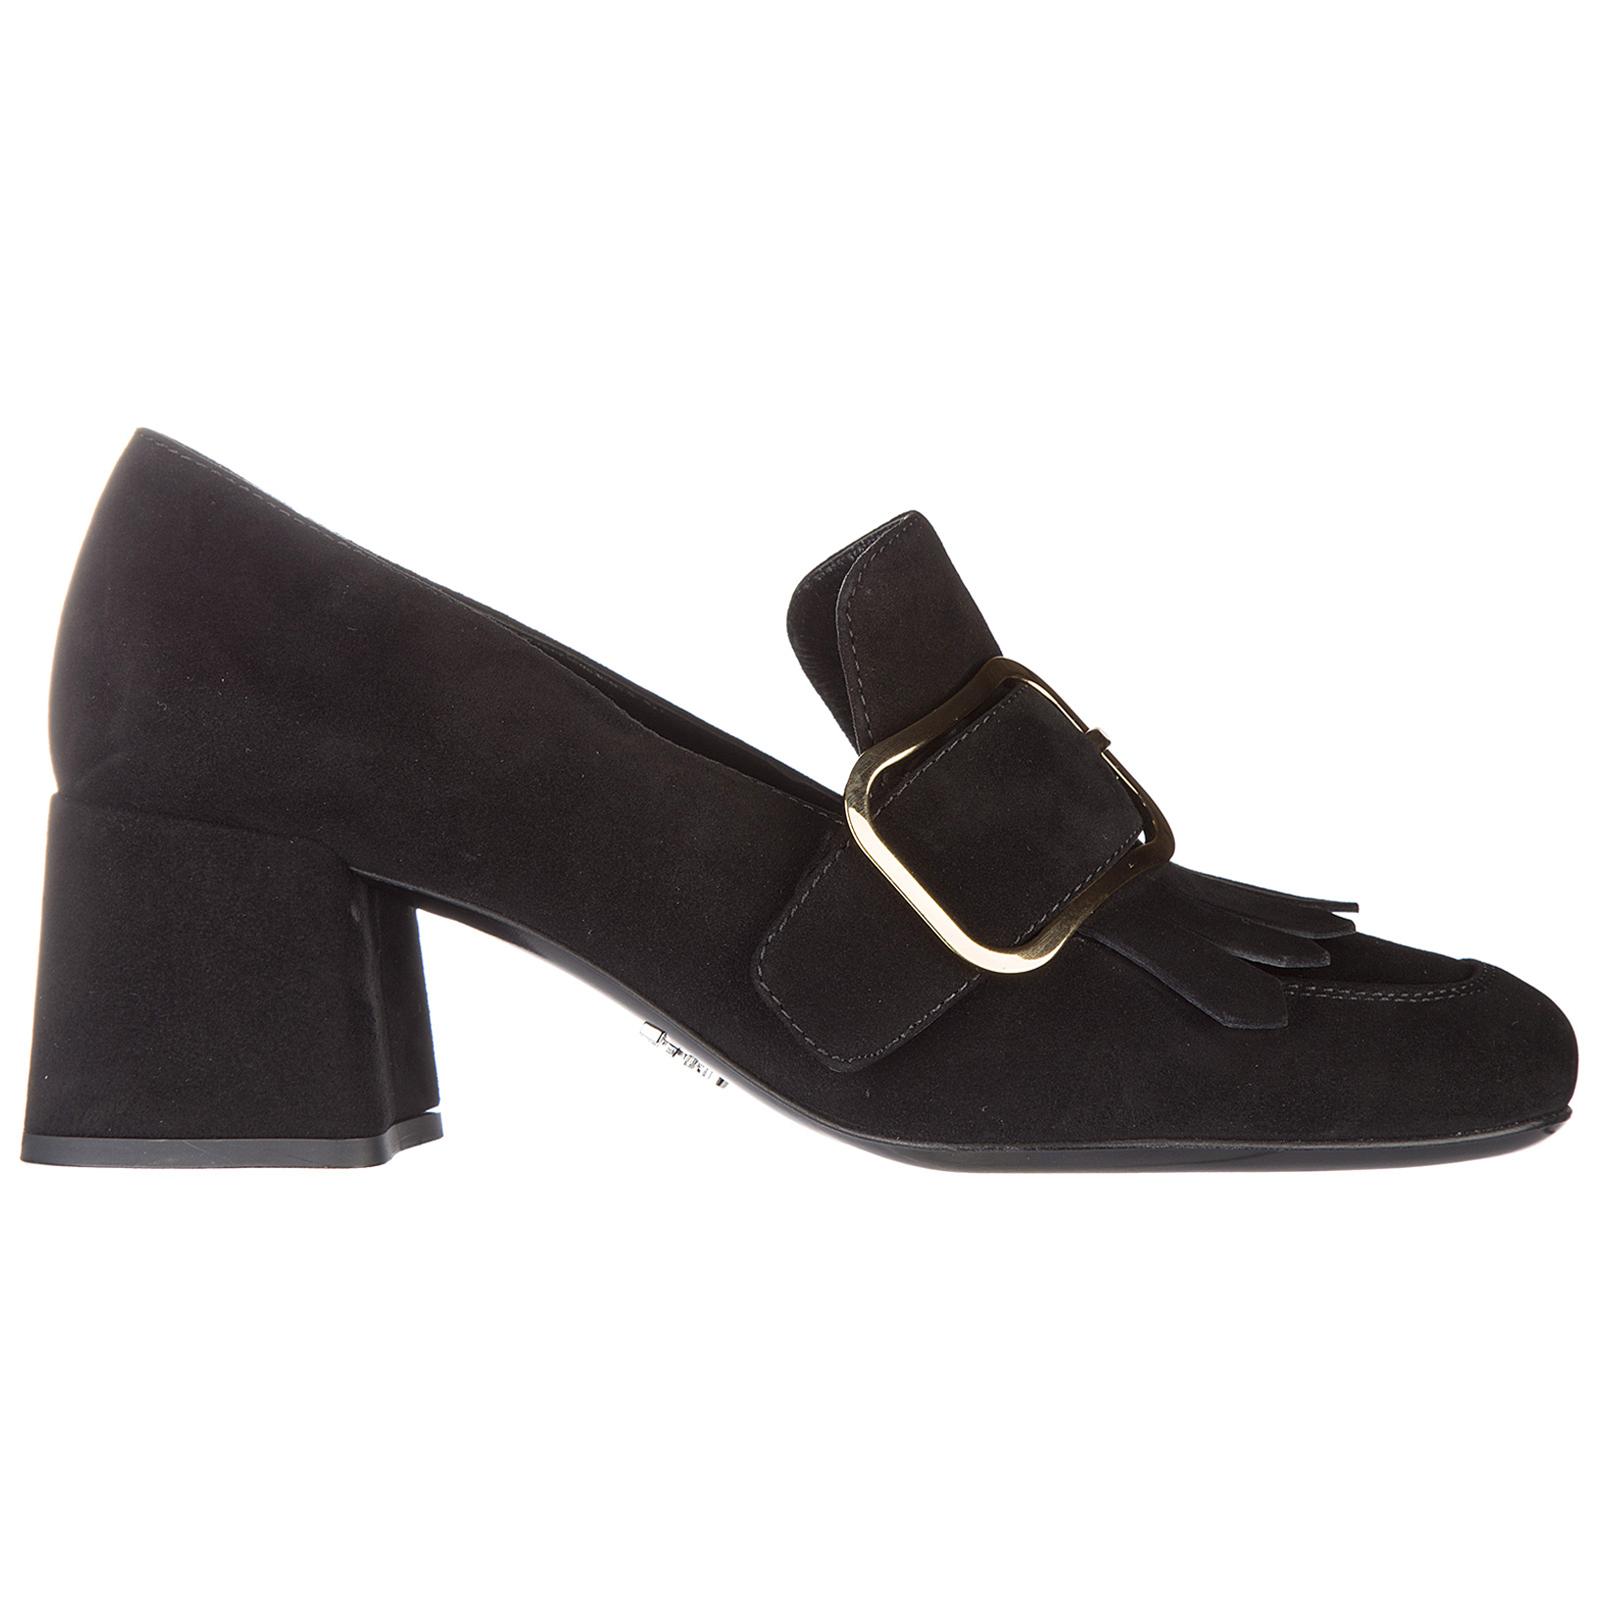 Decolletes decoltè scarpe donna con tacco camoscio